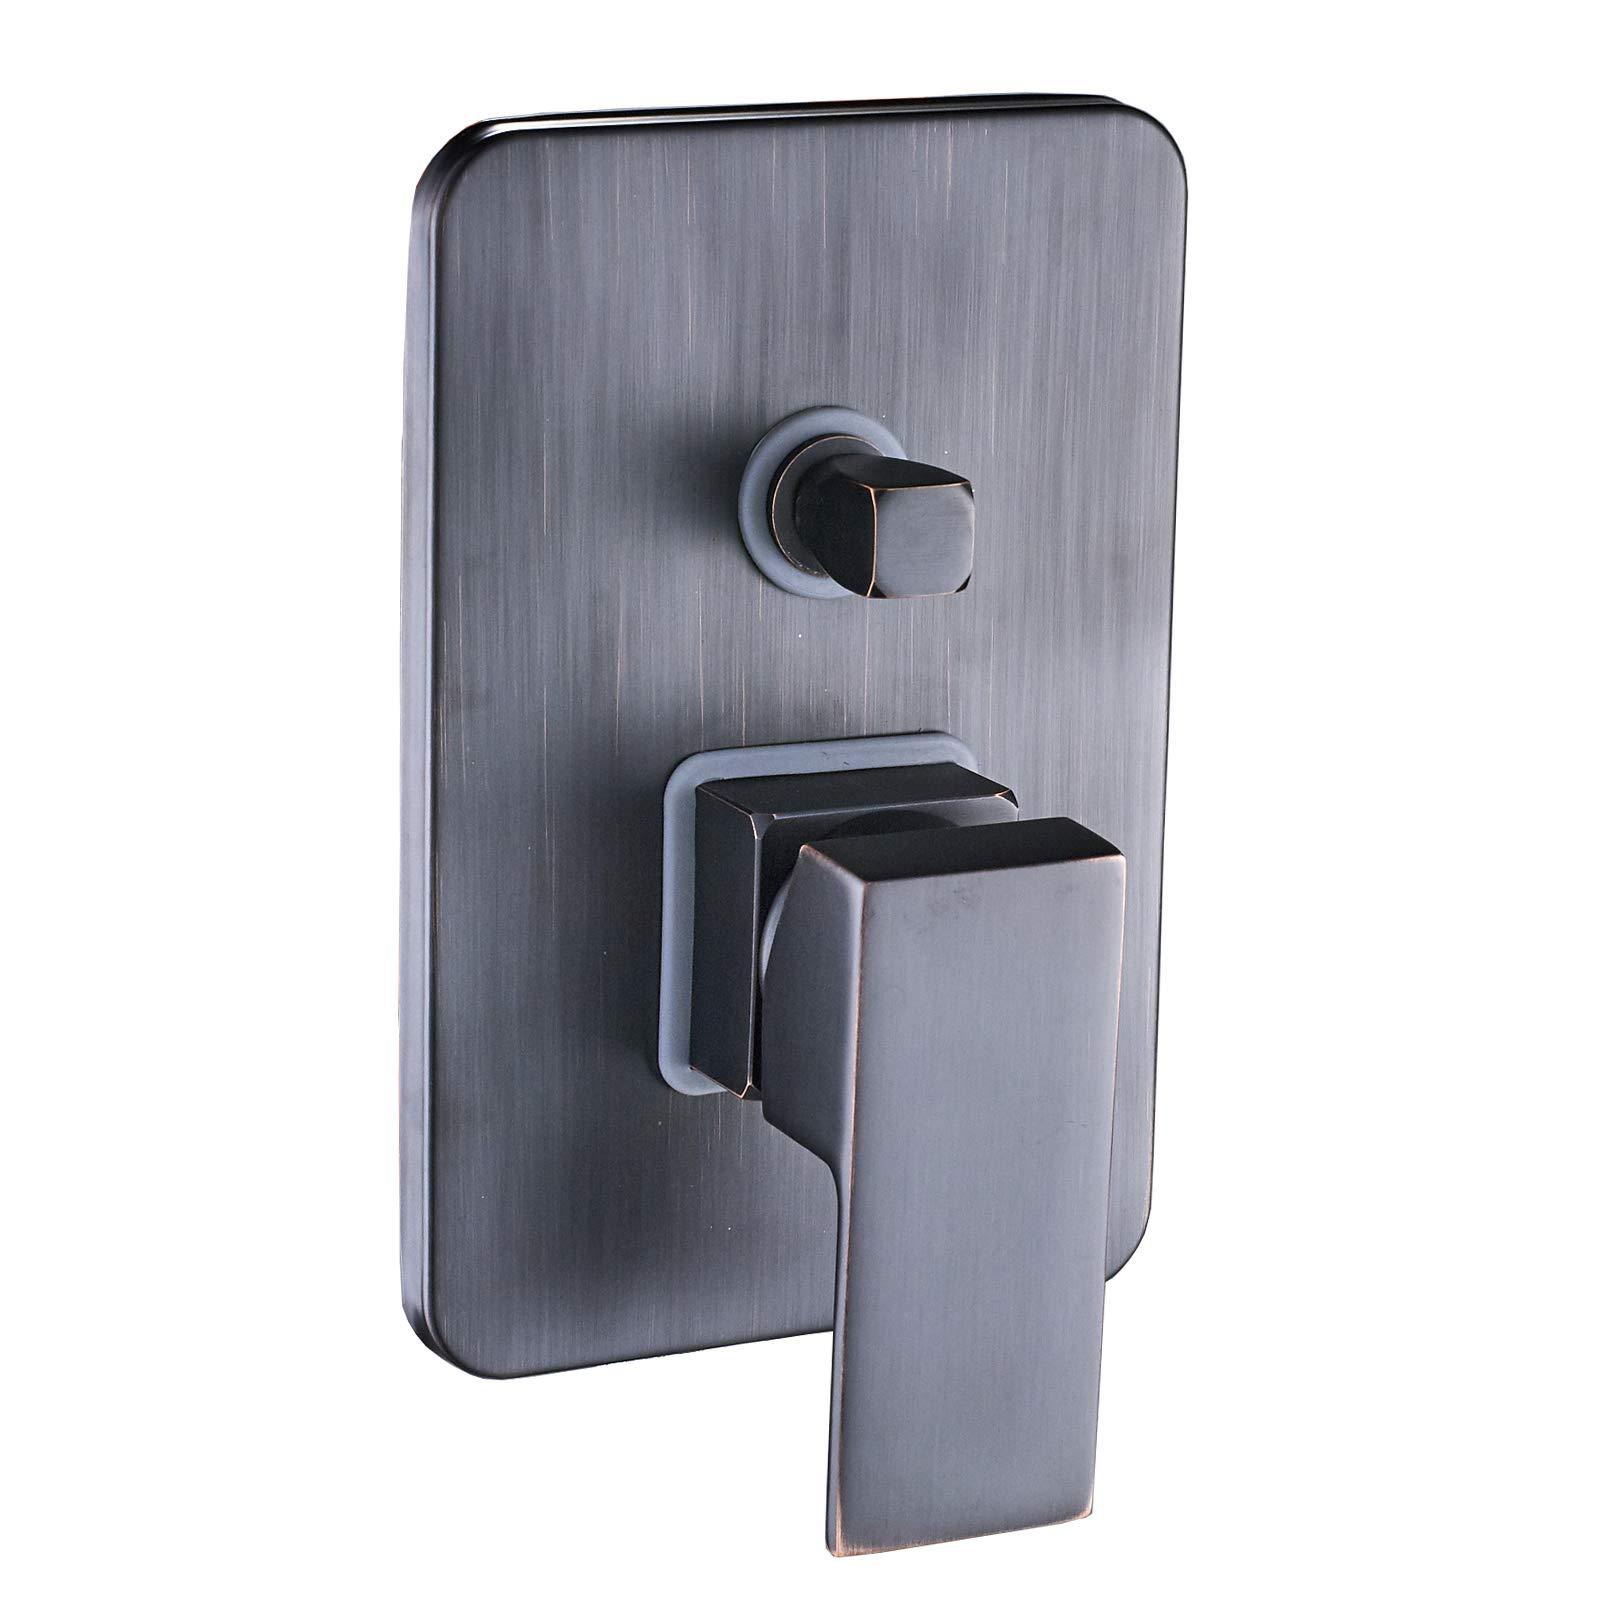 Rozin 2-way Control Shower Mixer Valve Oil Rubbed Bronze